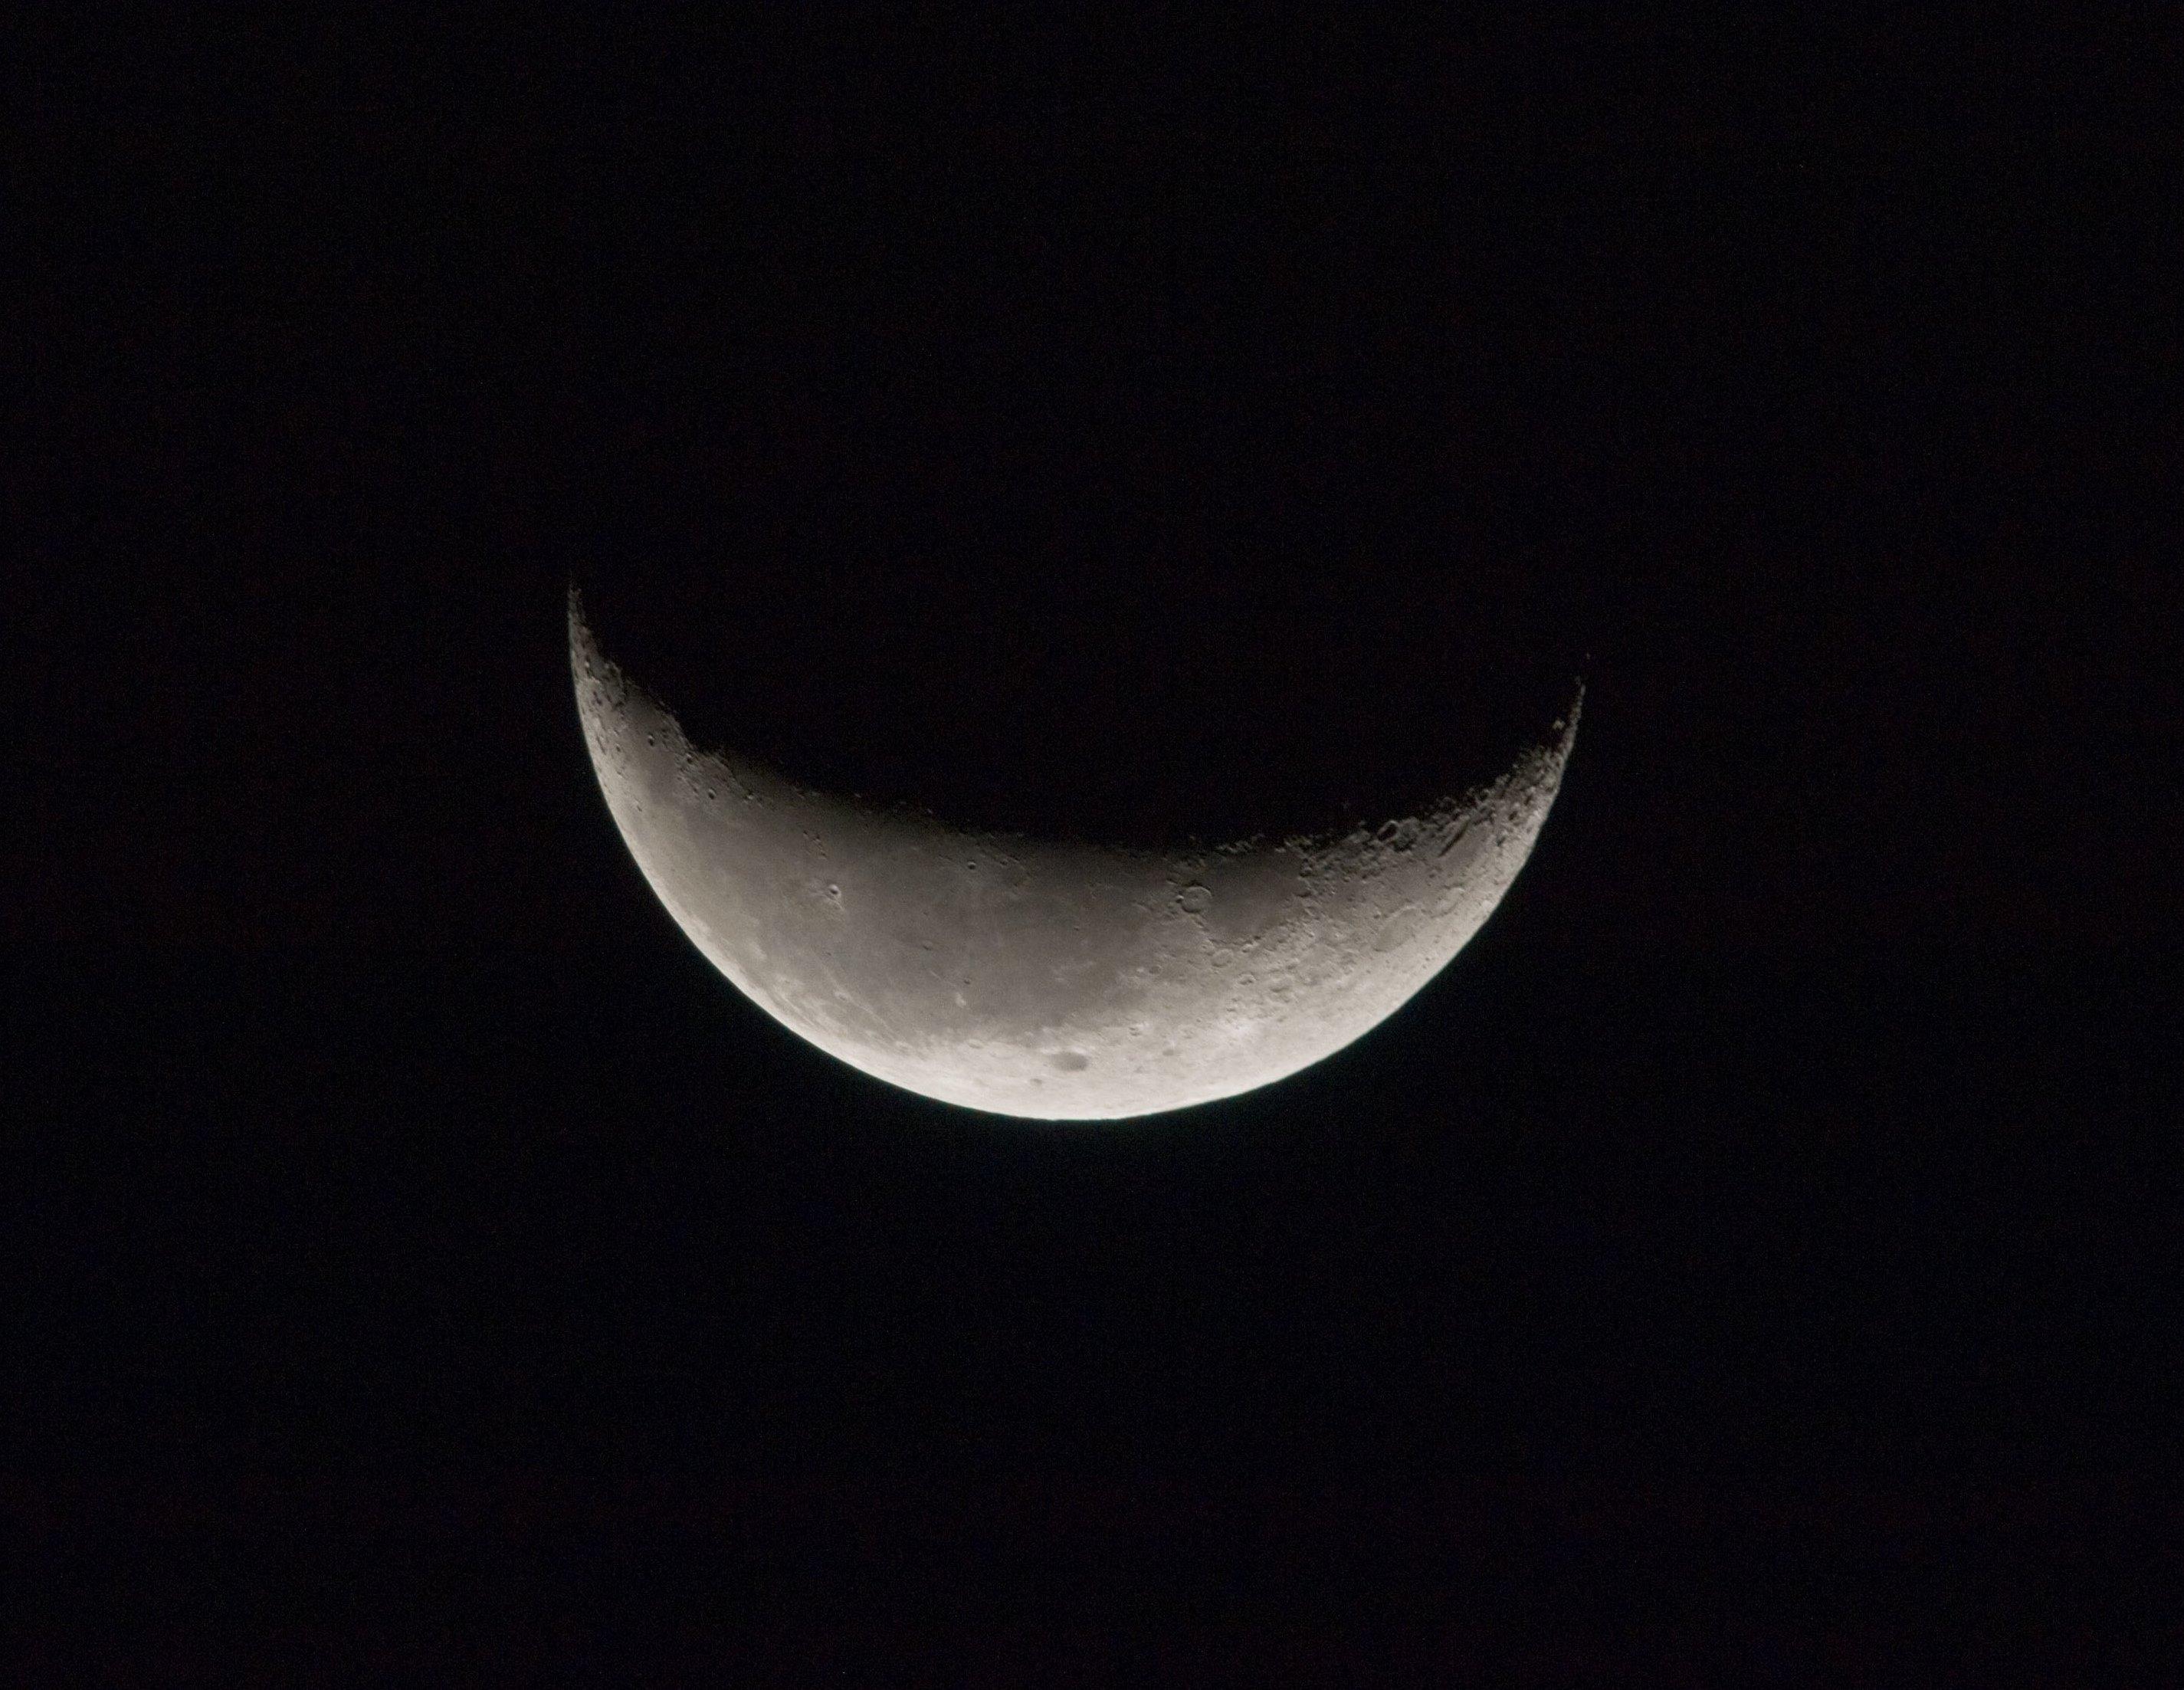 Moon Images Nasa a Crescent Moon Backdropped